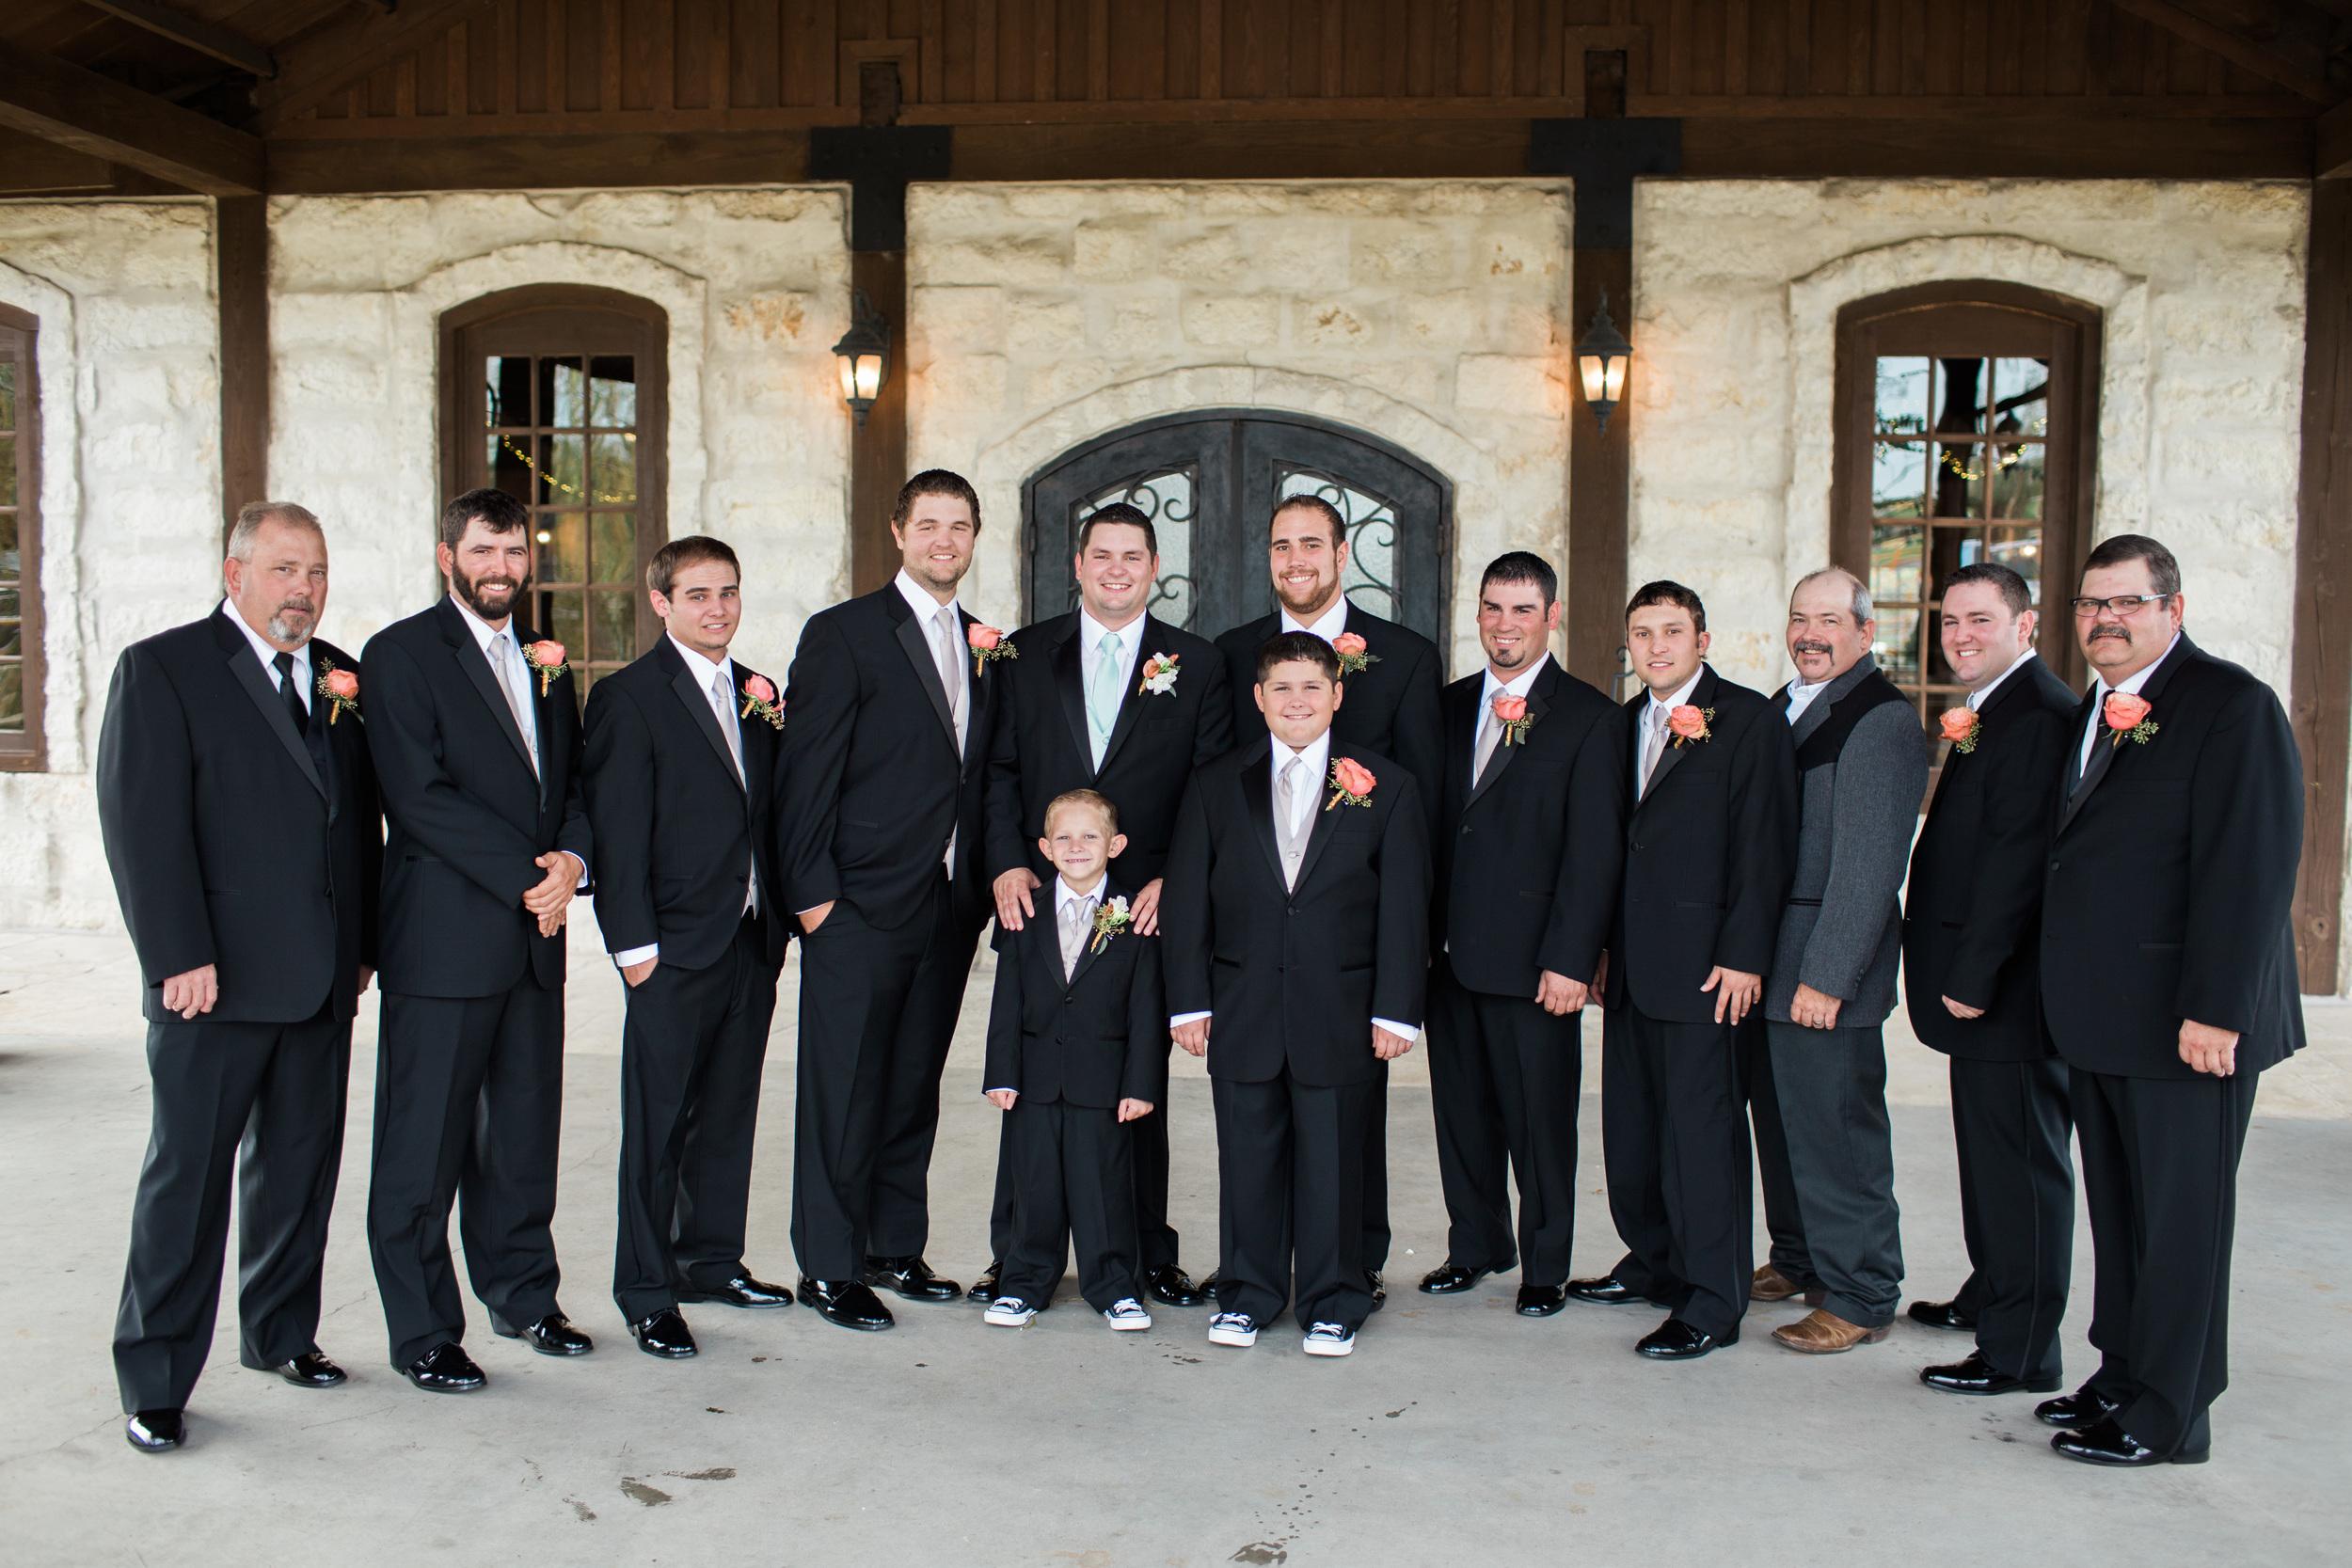 Plan Our Day Houston Wedding Coordinators | Wedding Blog | Country Wedding Inspiration at Pecan Springs in Brookshire, TX |Houston Weddings